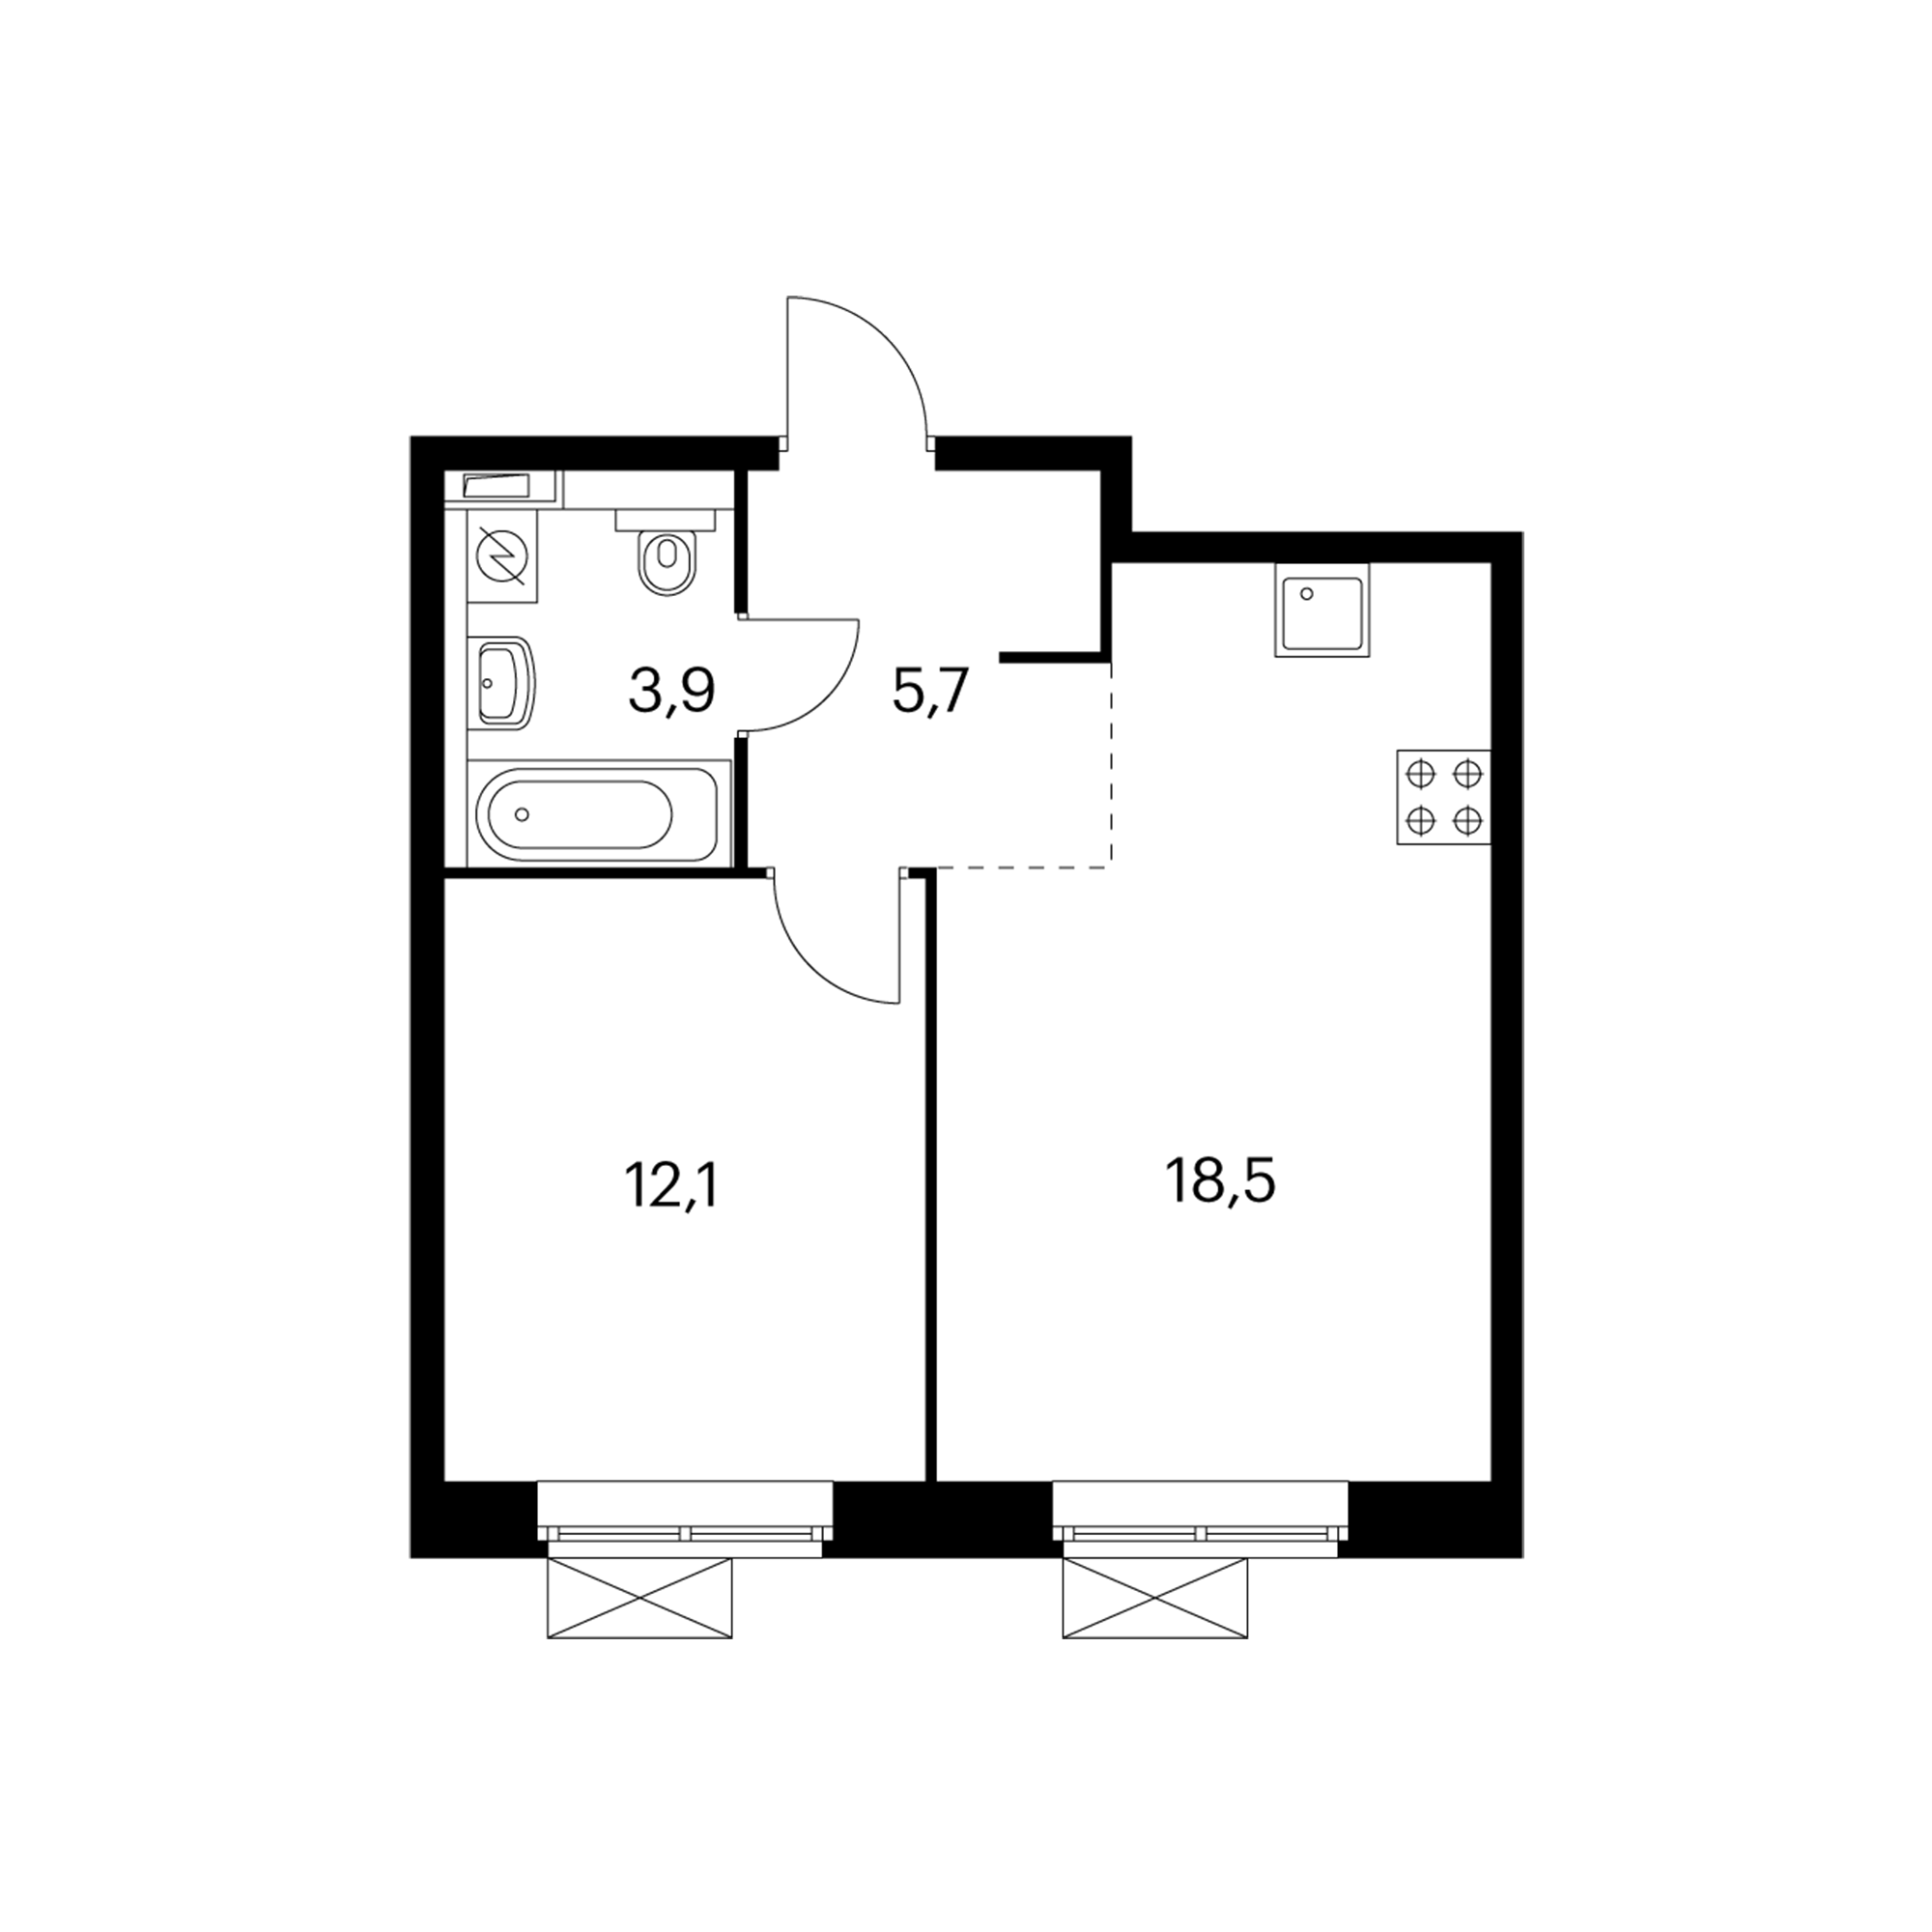 1KM1_6.9-6